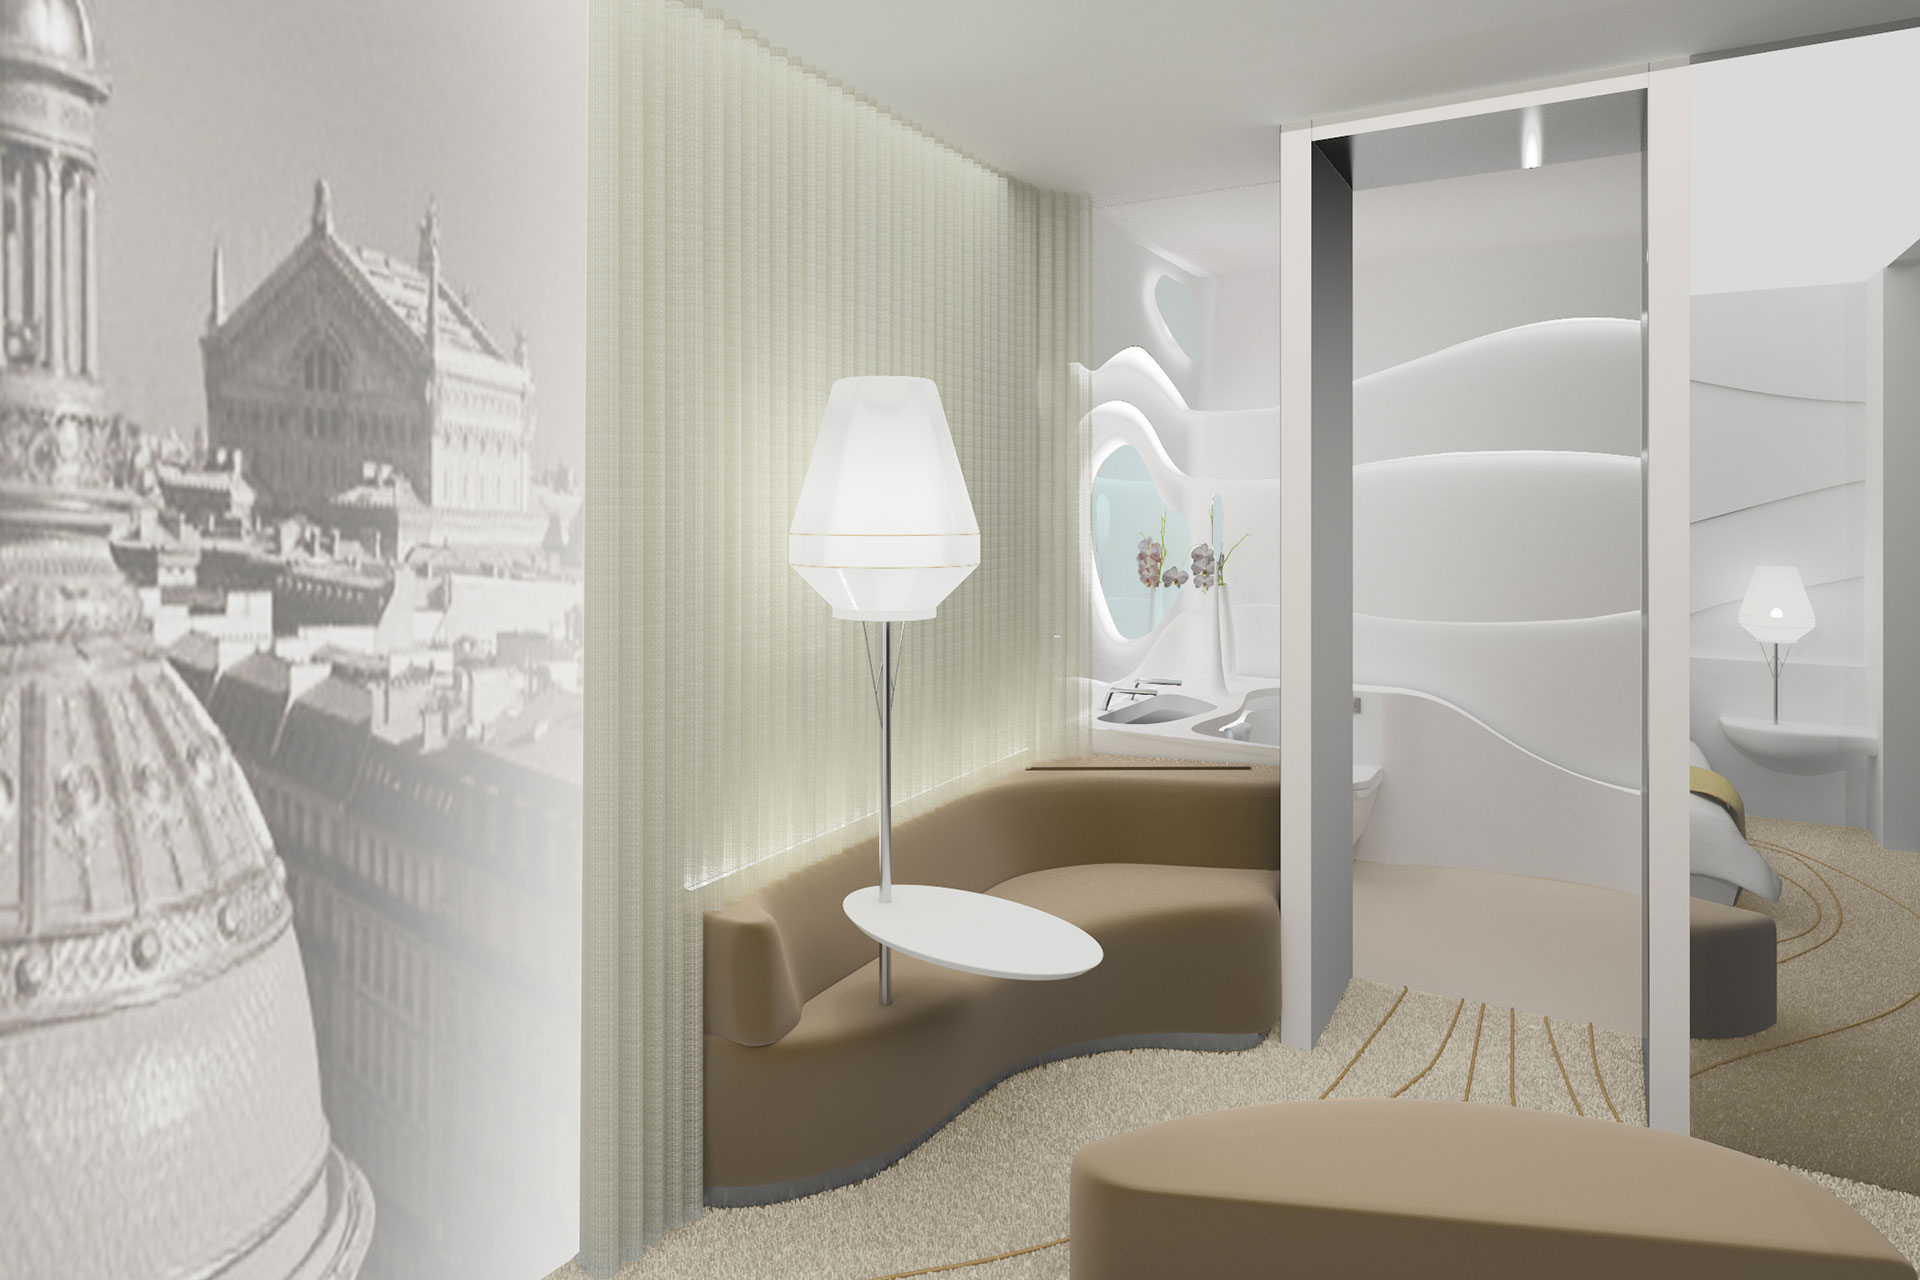 La Senses Room. crédit photo PH2B